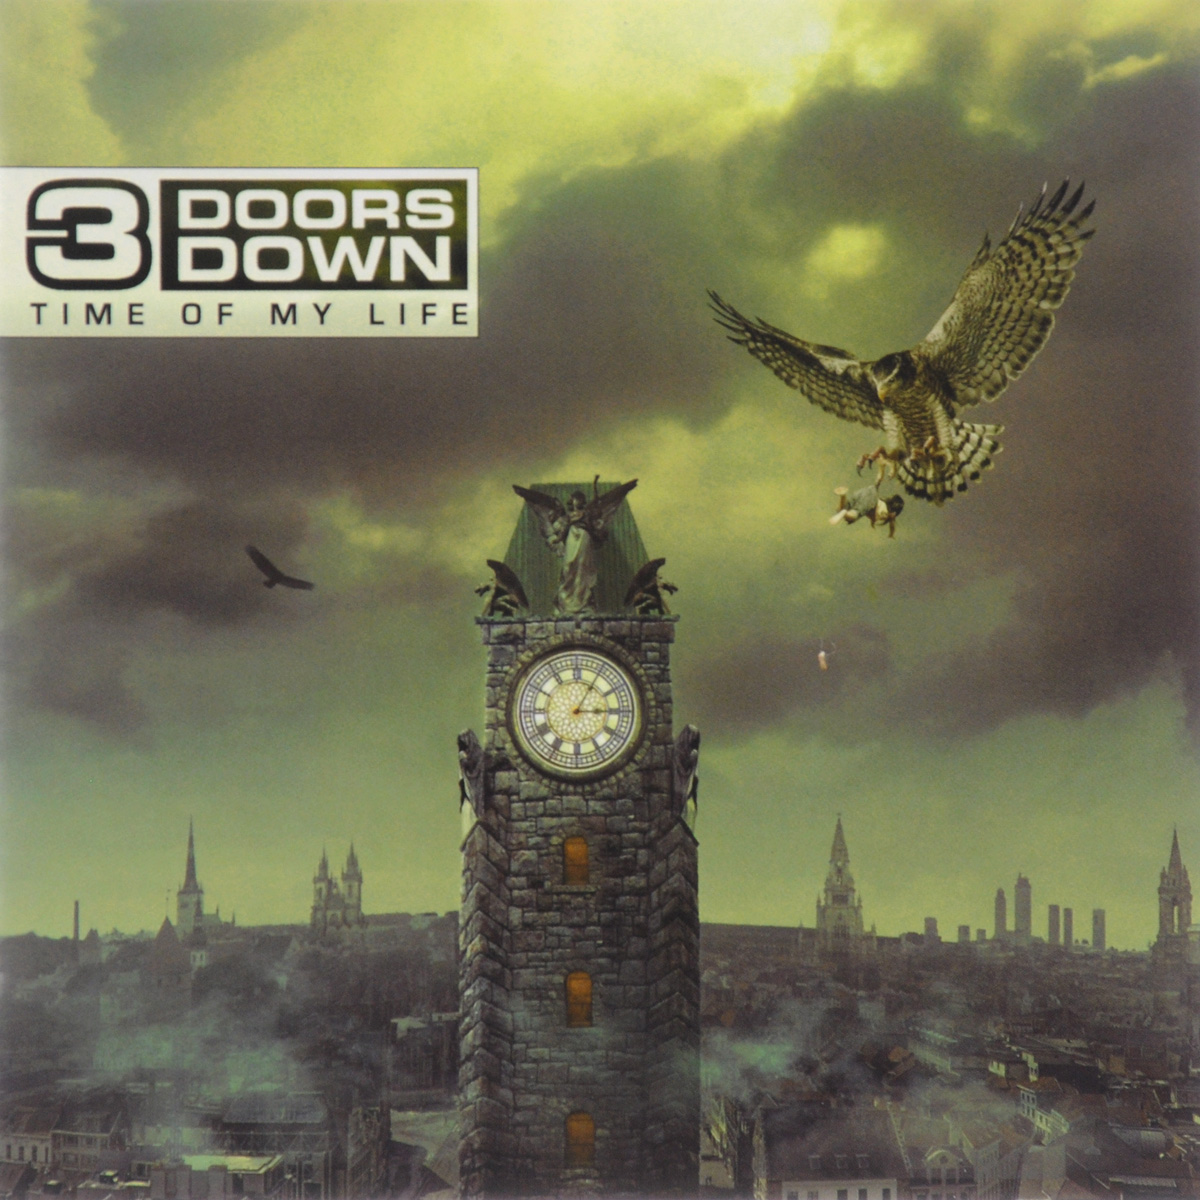 цена на 3 Doors Down 3 Doors Down. Time Of My Life